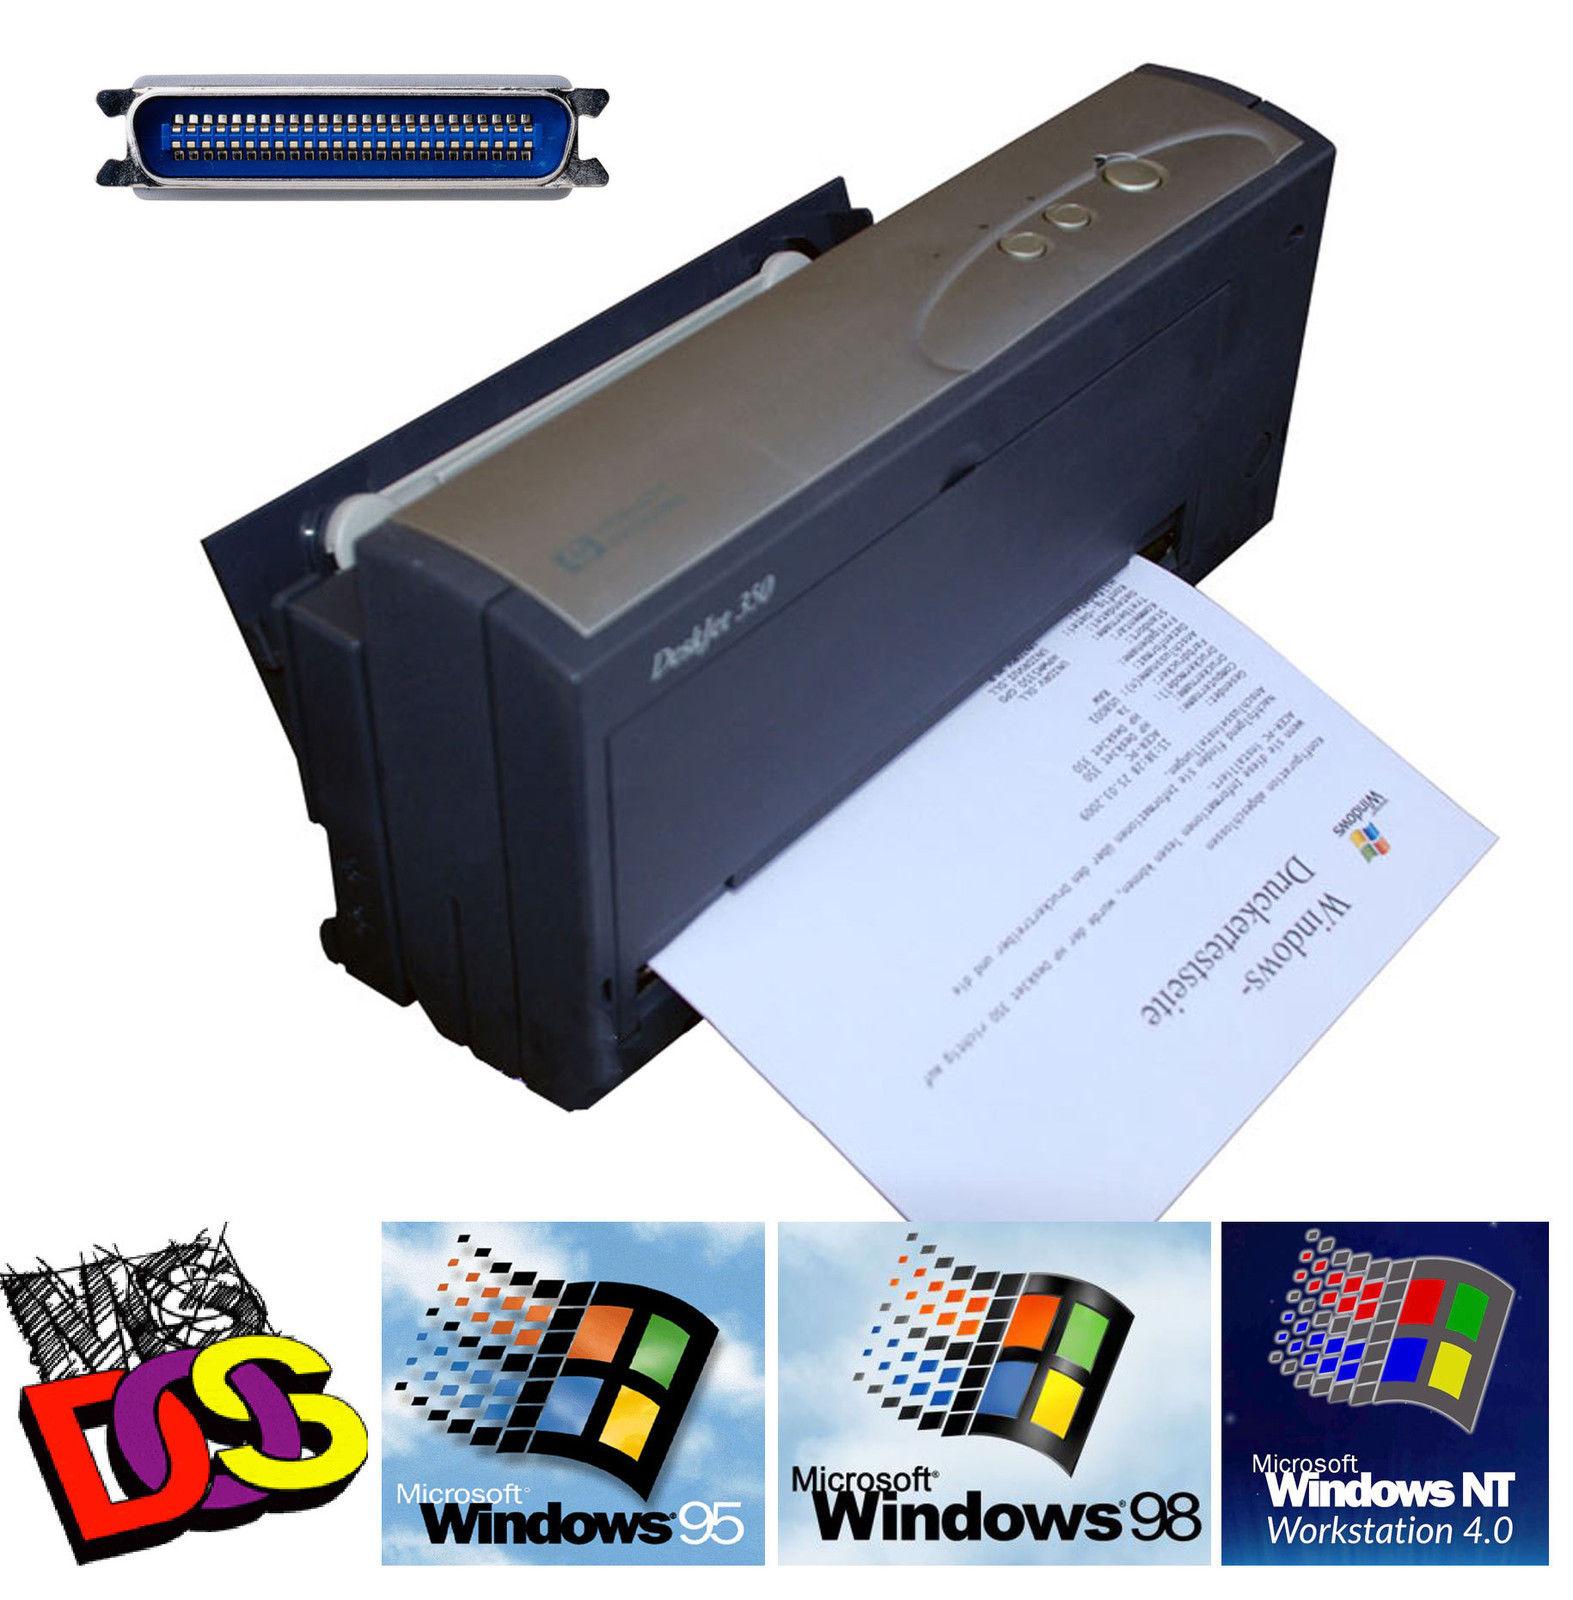 /tmp/con-5d14eff66f246/10441_Product.jpg